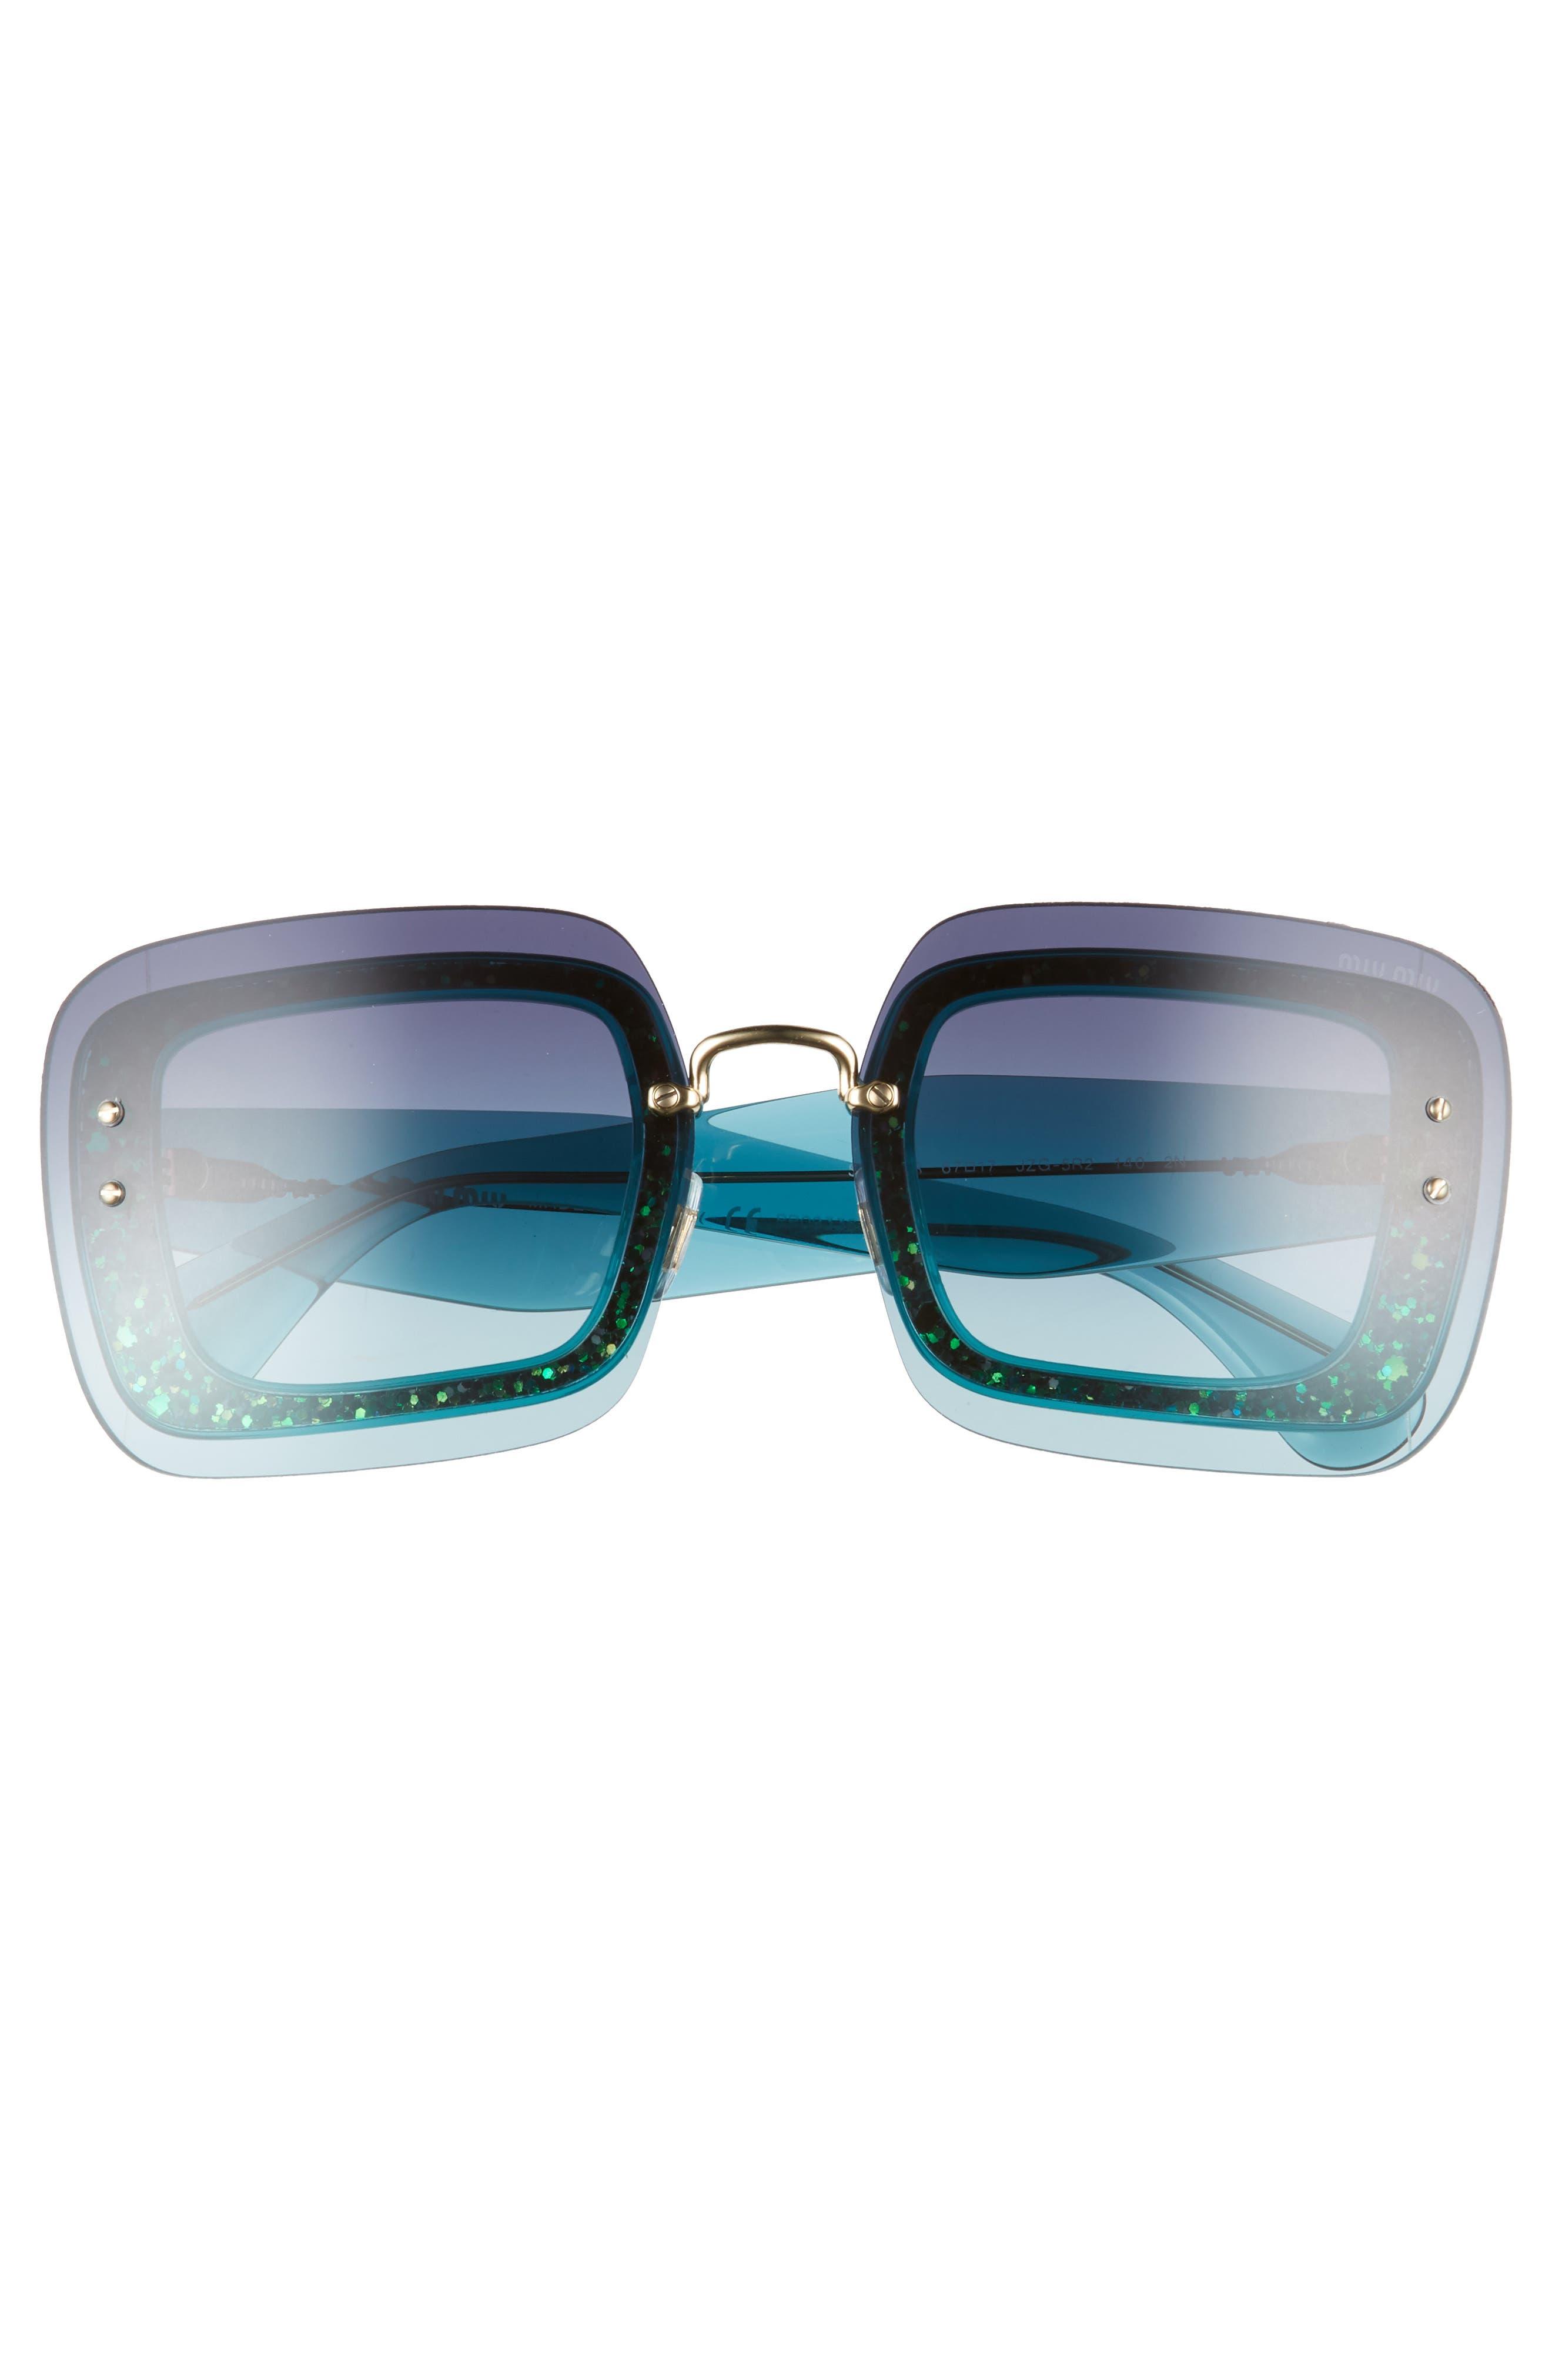 67mm Square Sunglasses,                             Alternate thumbnail 3, color,                             TURQUOISE GRADIENT